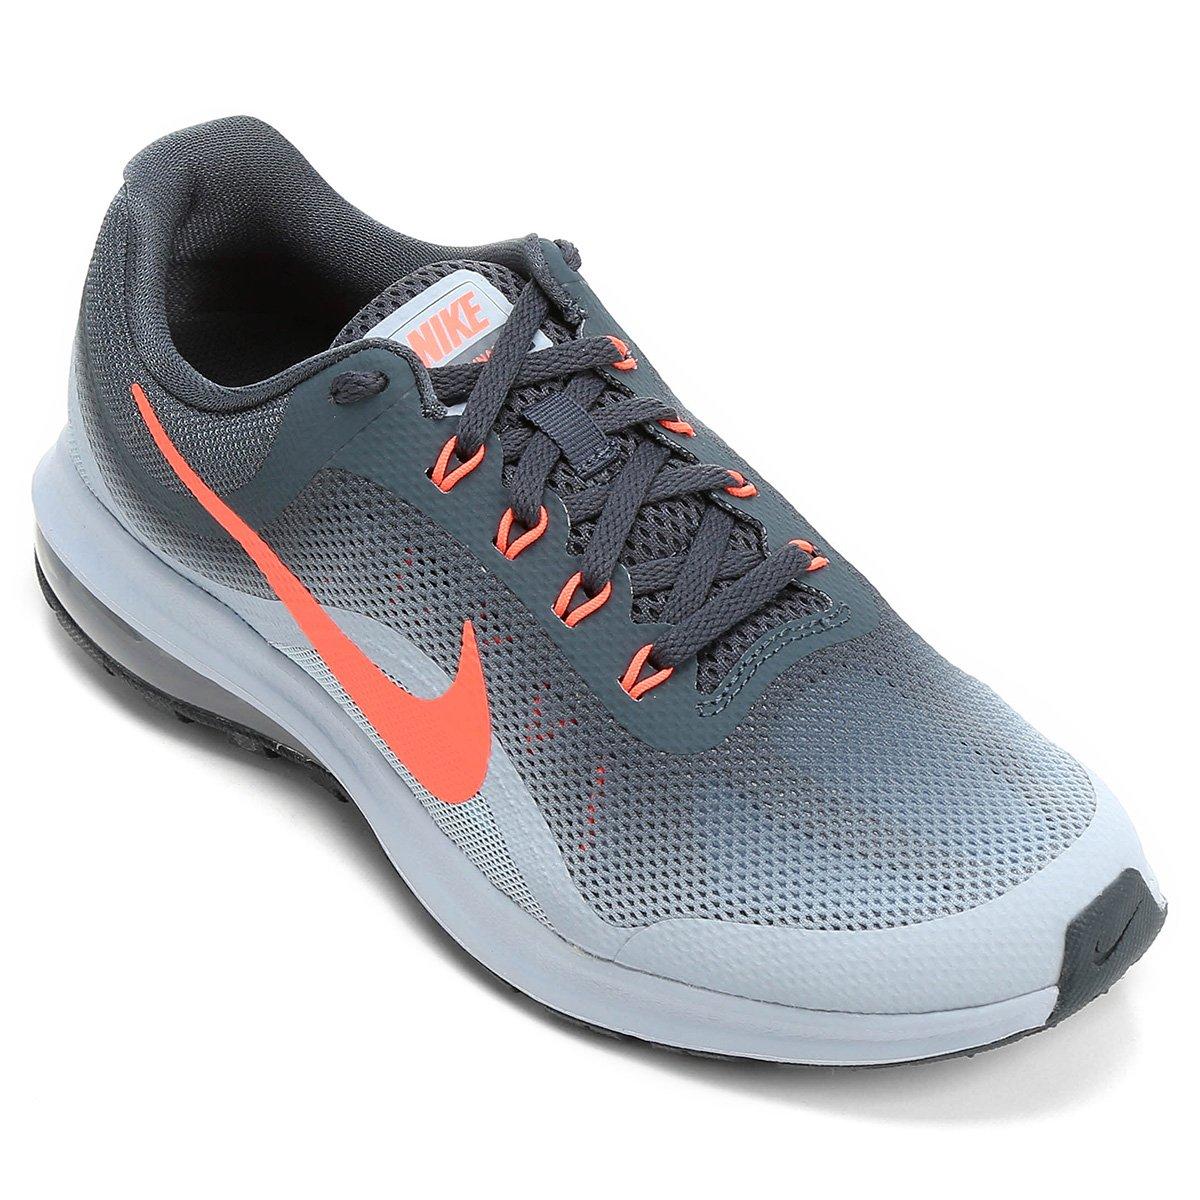 best service dbb3b ff030 ... australia mens nike air raid shoes sneakers size 14 basketball metallic  gold white d12. new